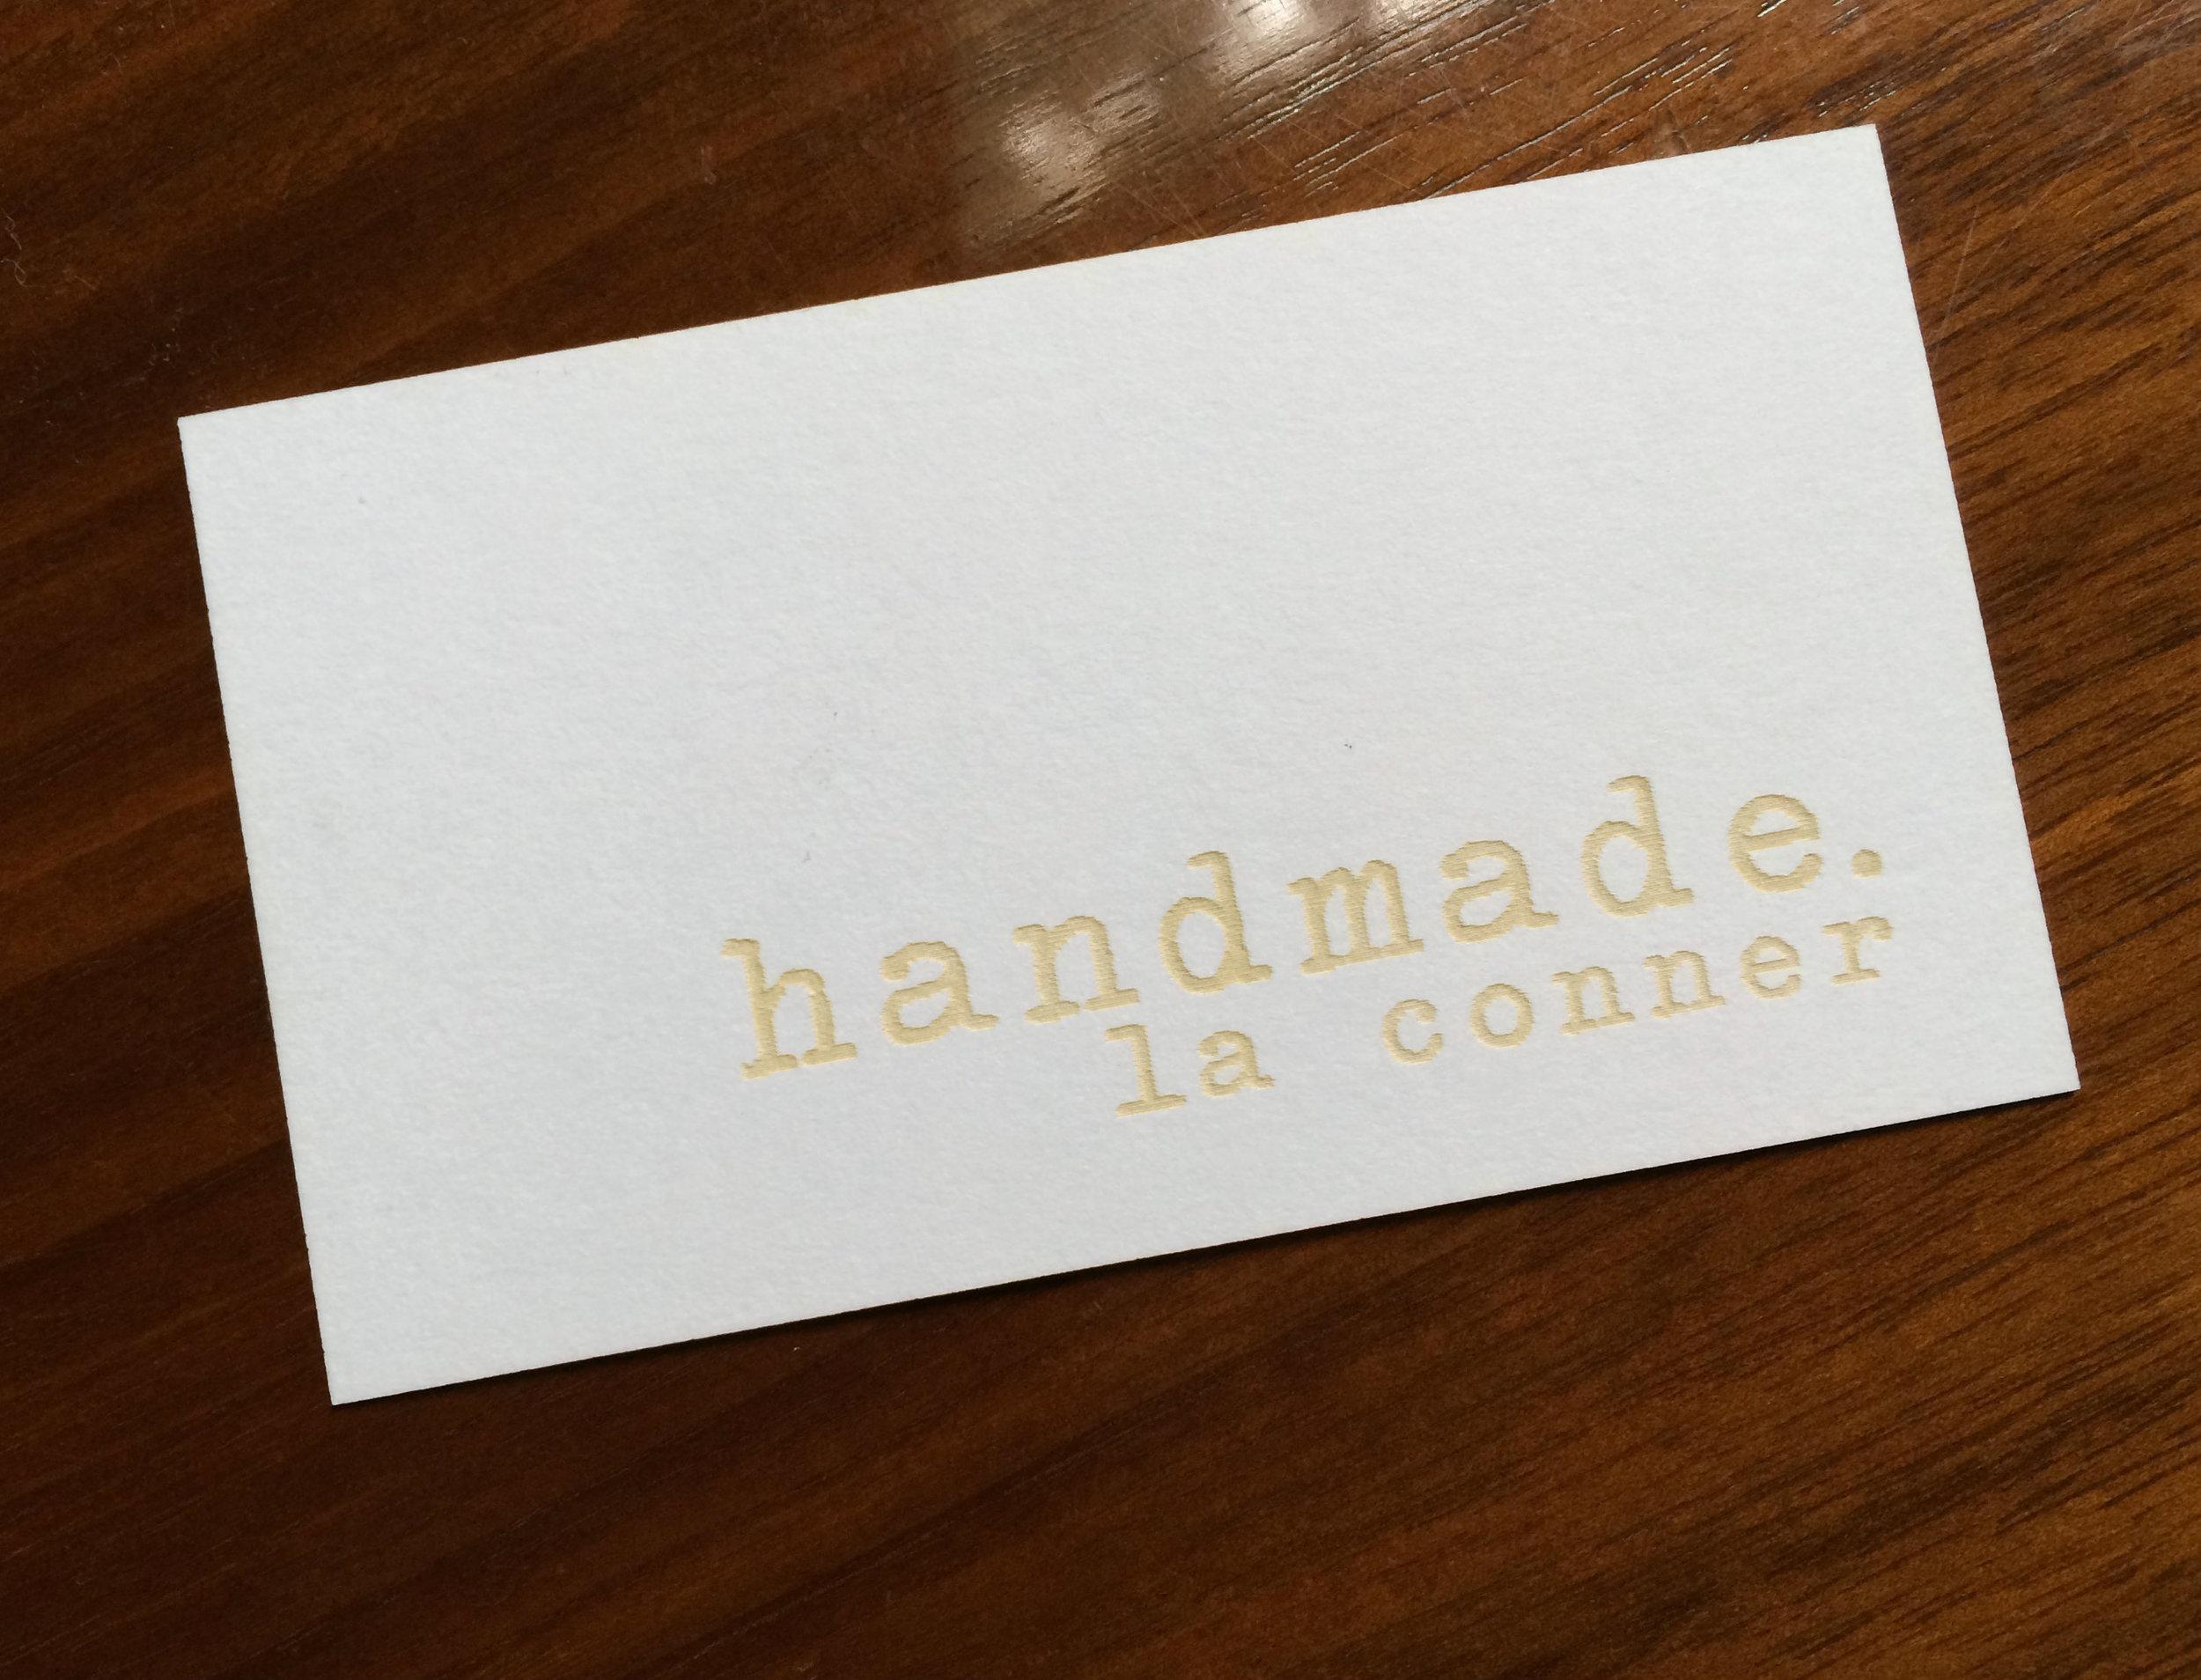 handmade. la conner